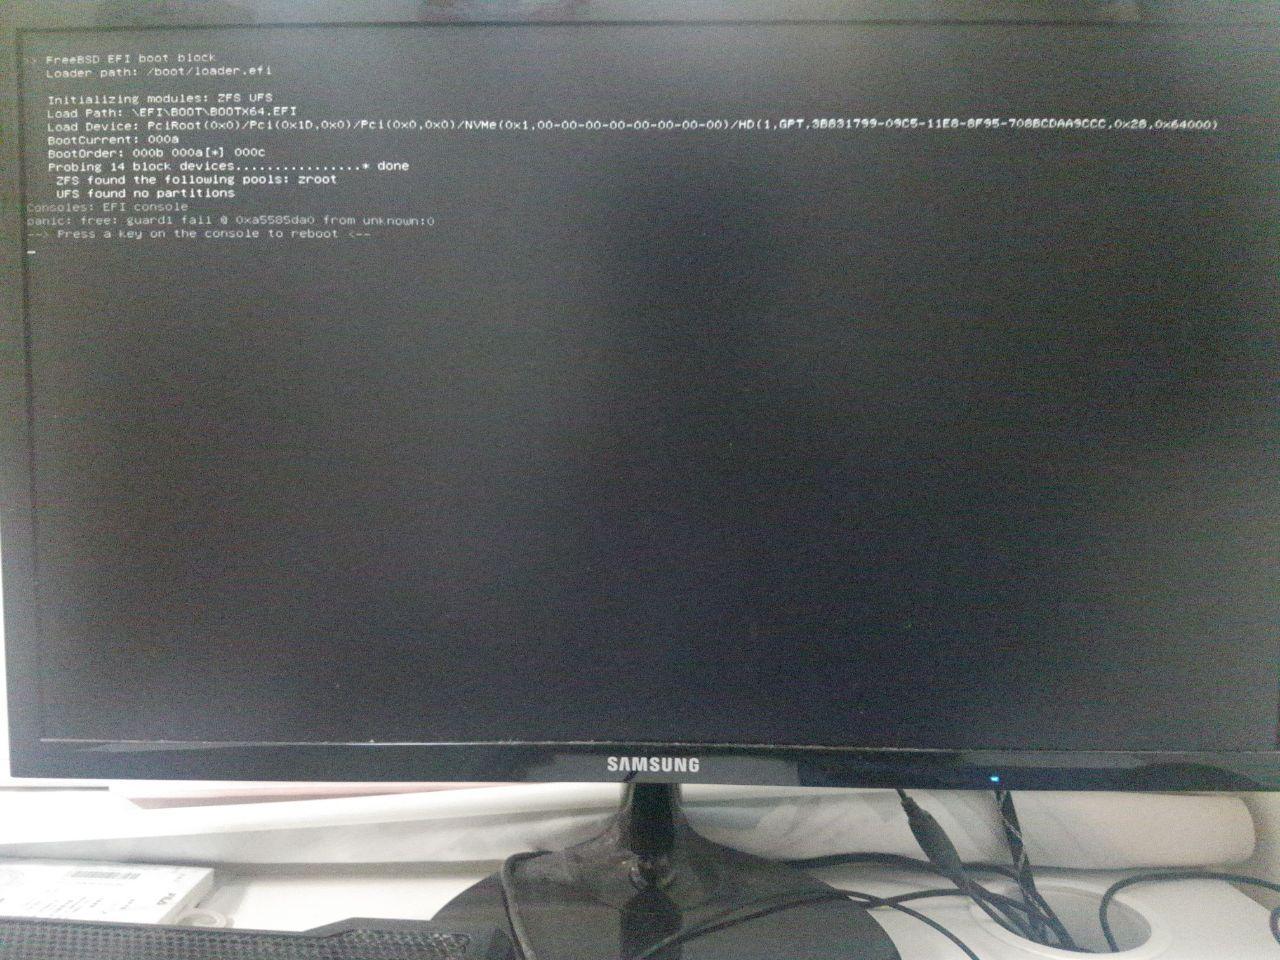 230501 – EFI loader fails with